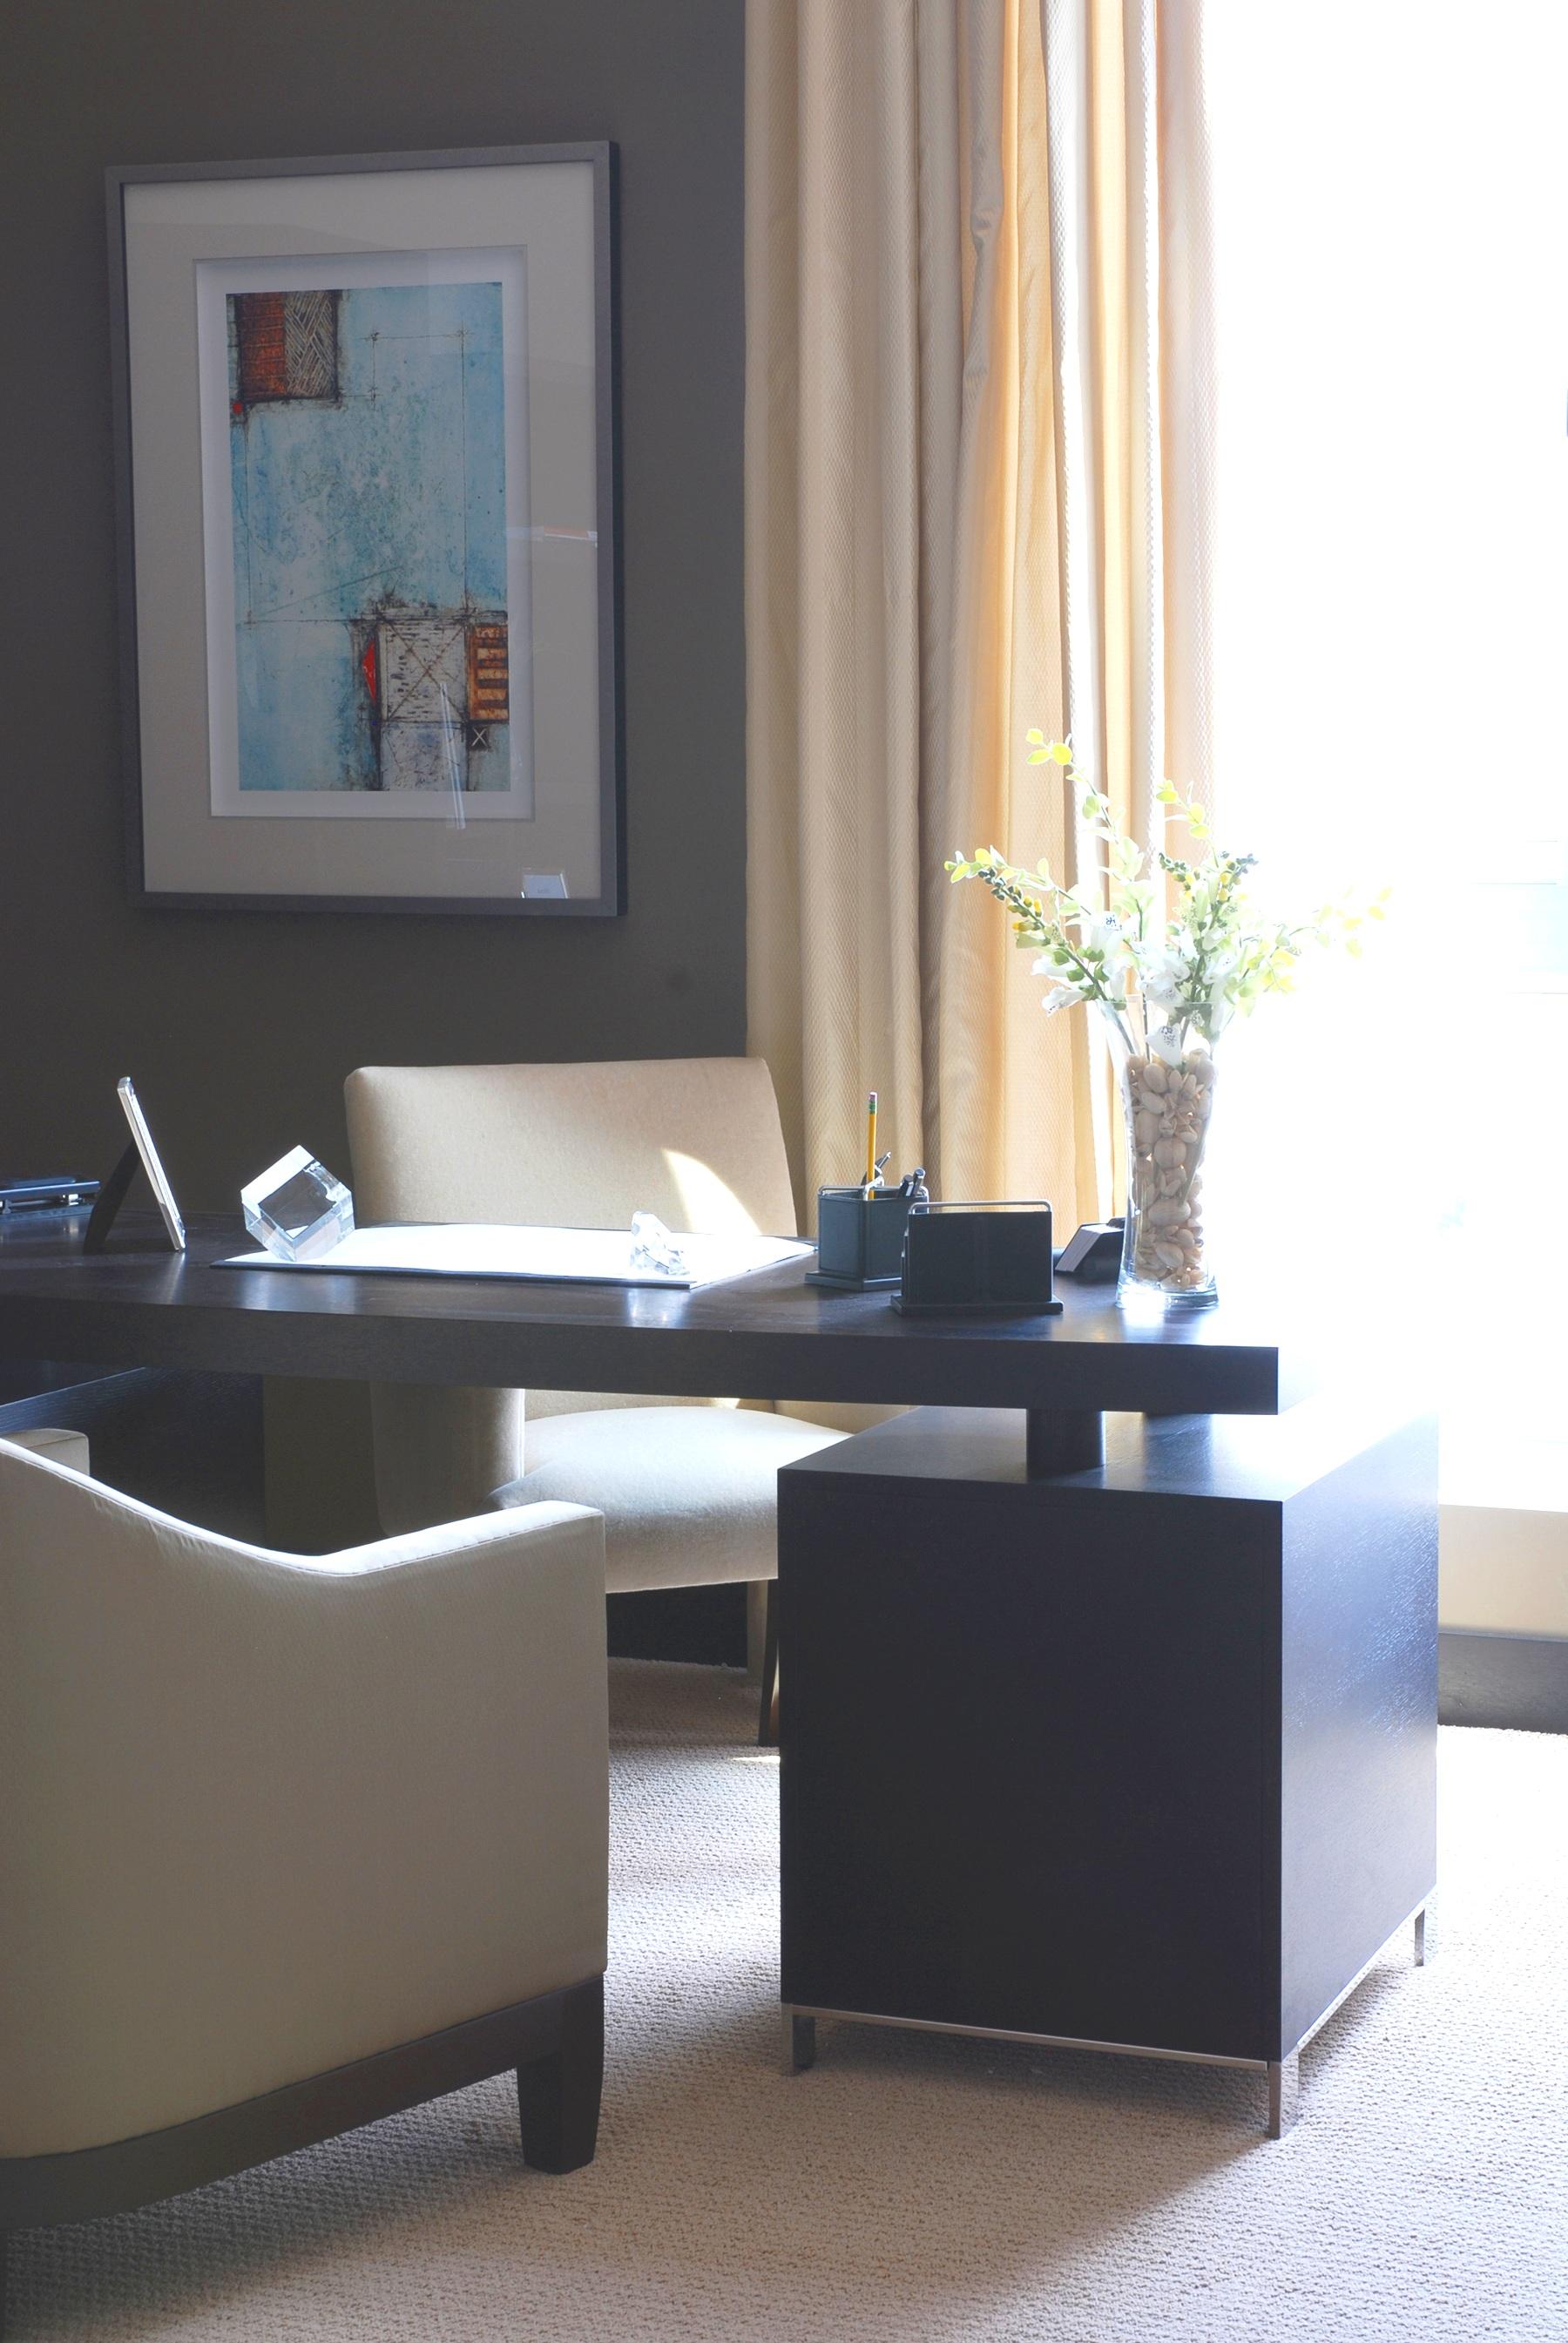 11_penthouse_office1.jpg